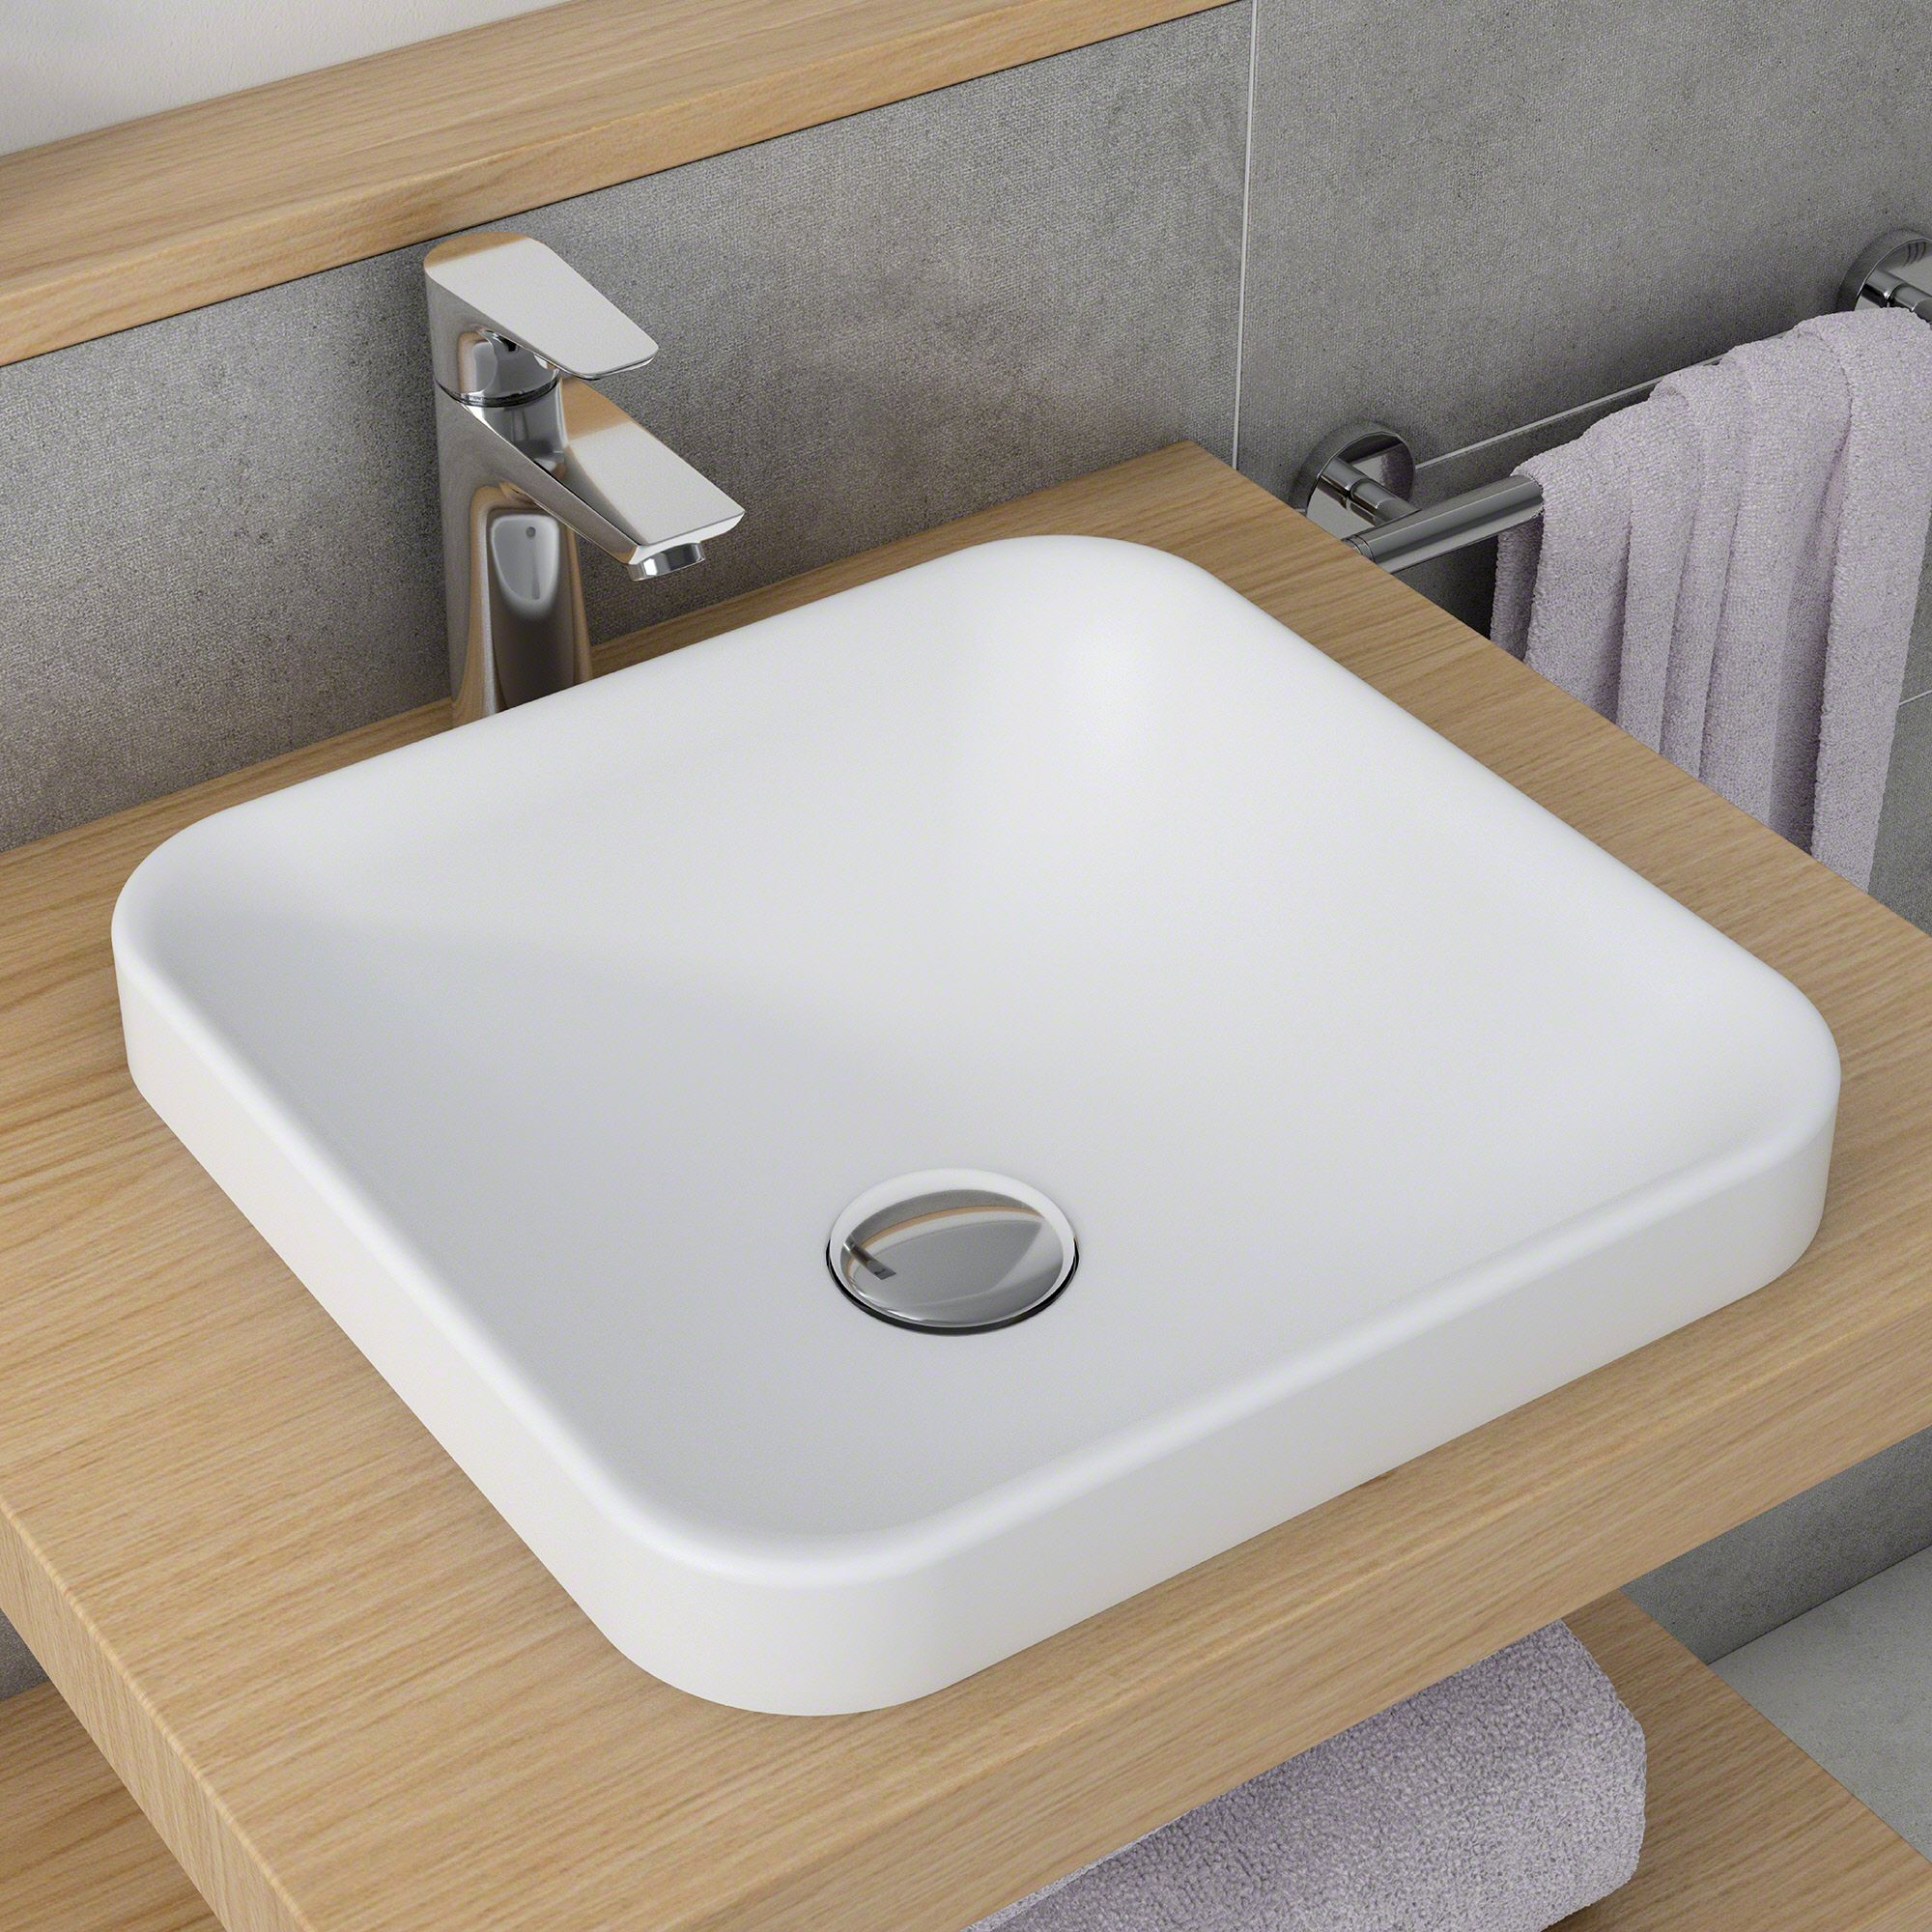 Kraus Natura Square Semi Recessed Composite Bathroom Sink With